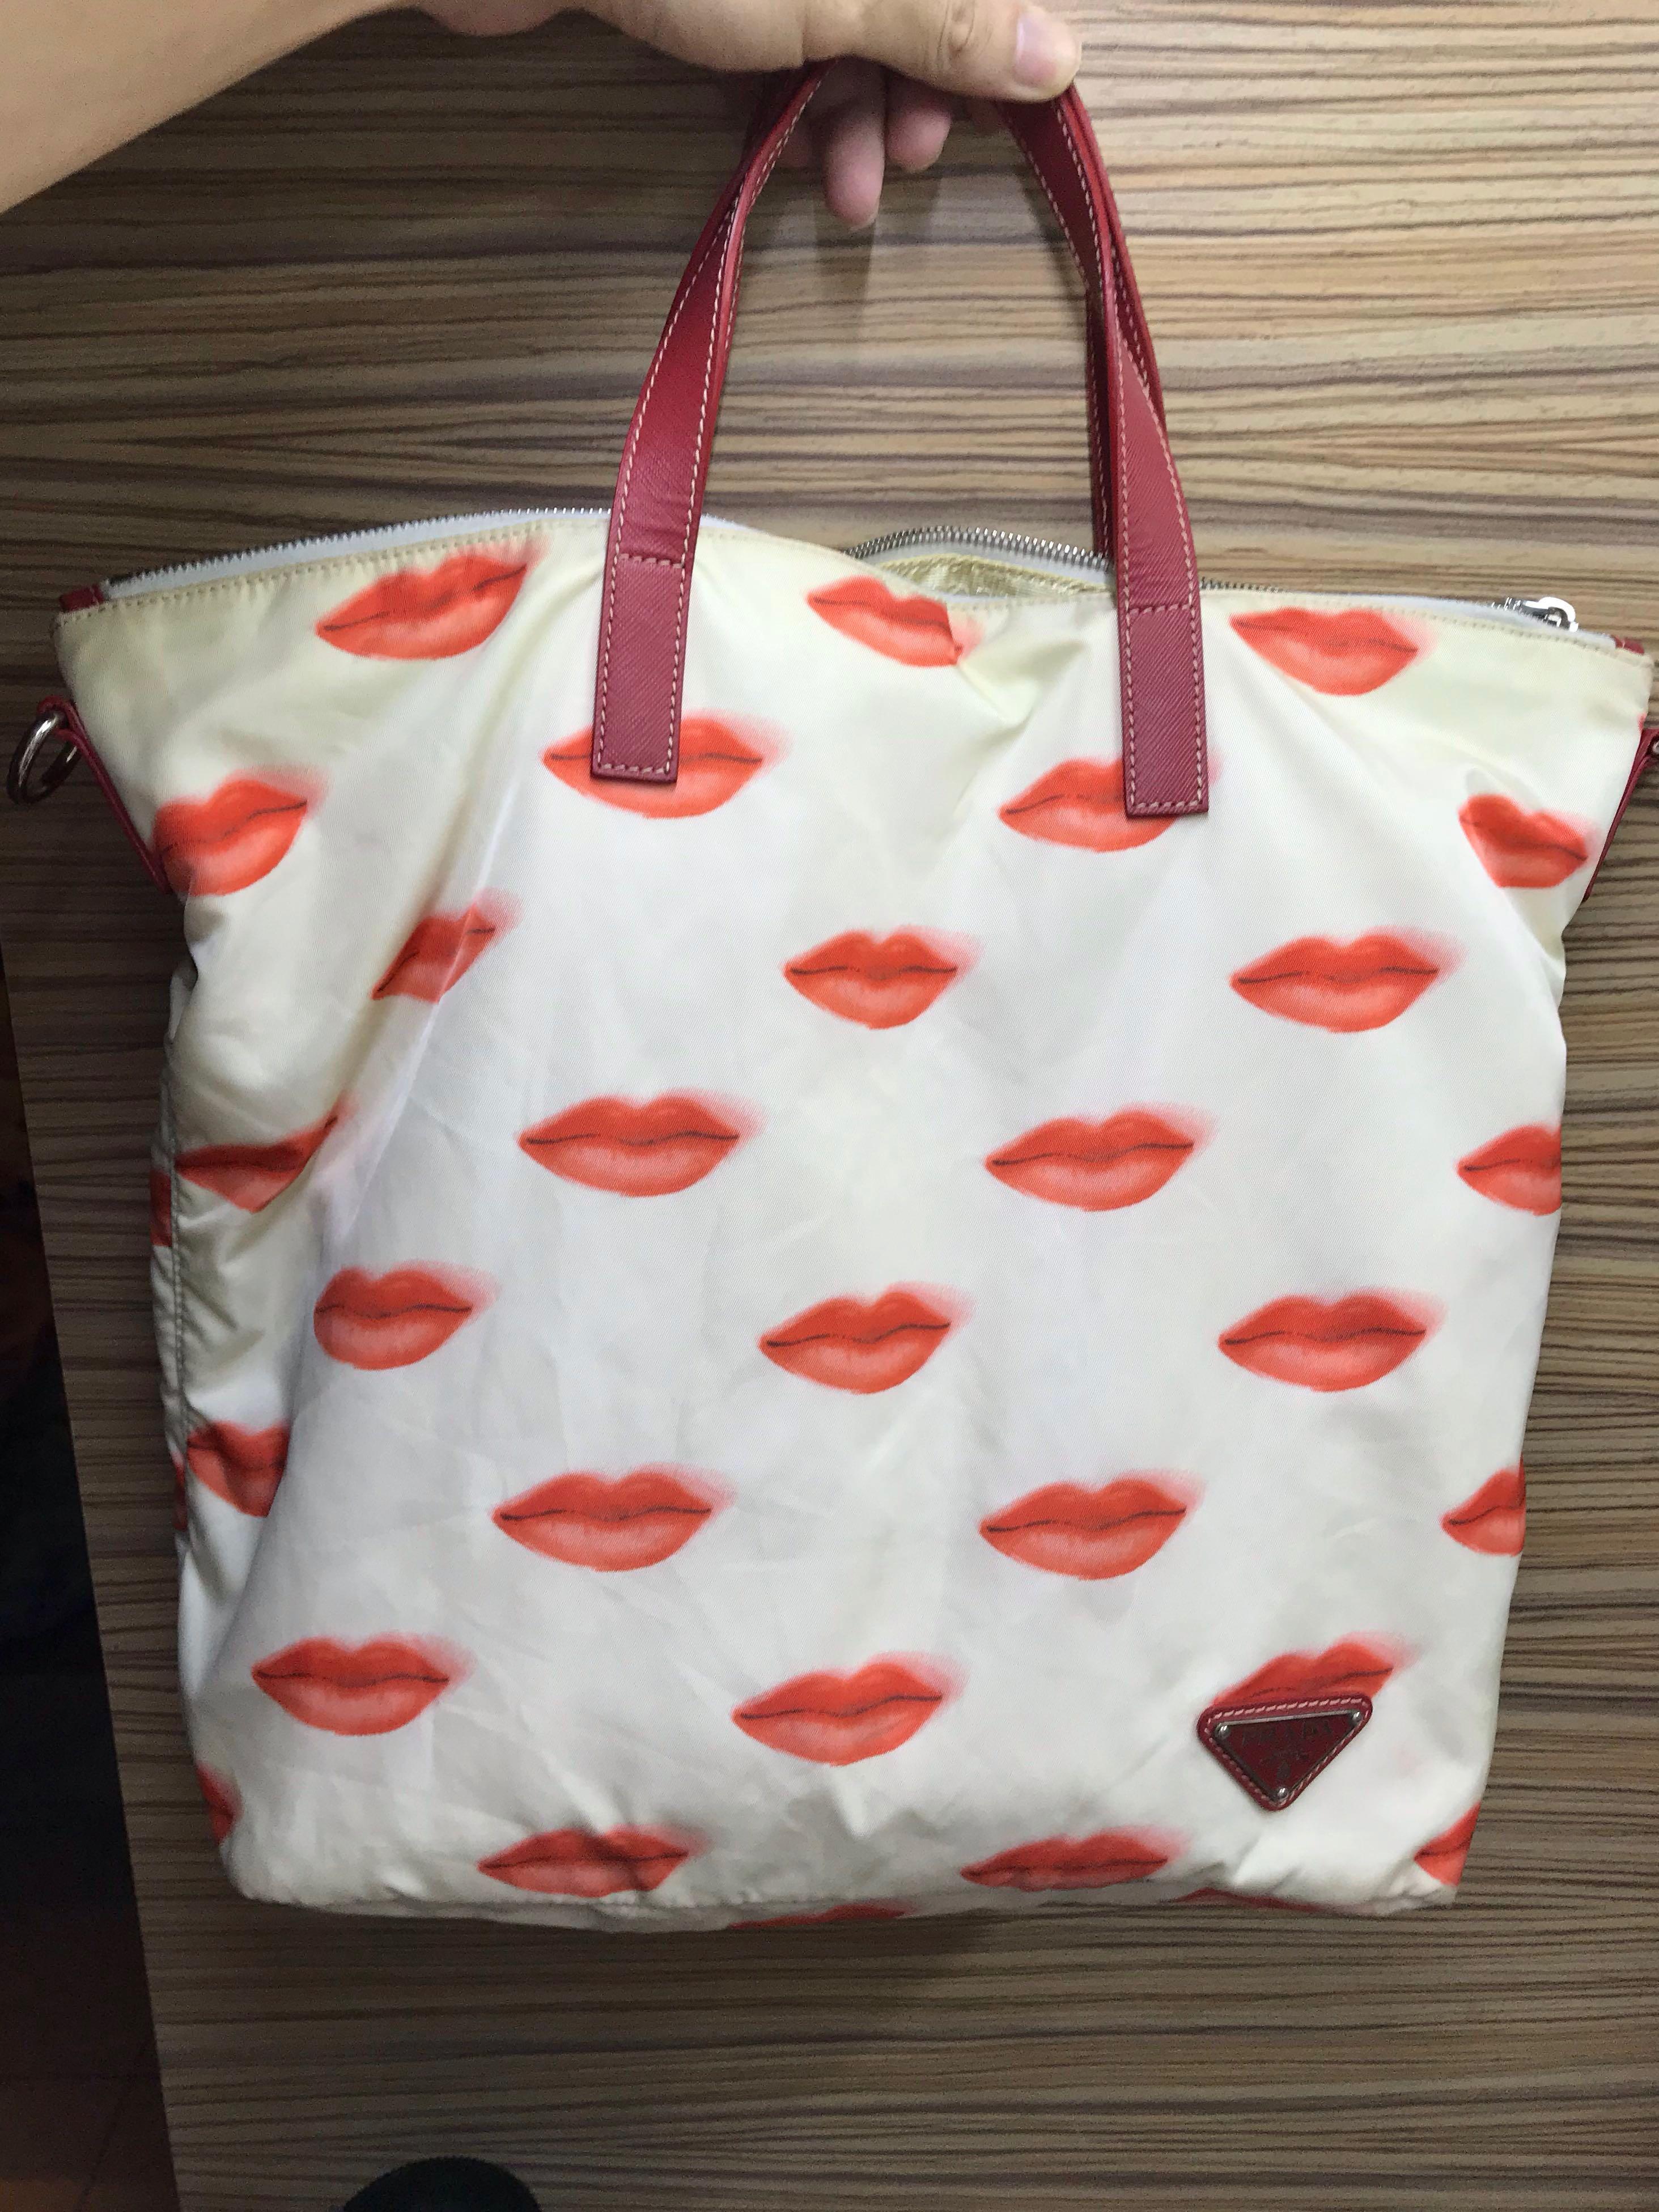 260e3d915d5fa7 Used Prada Tote Bag, Women's Fashion, Bags & Wallets, Handbags on ...